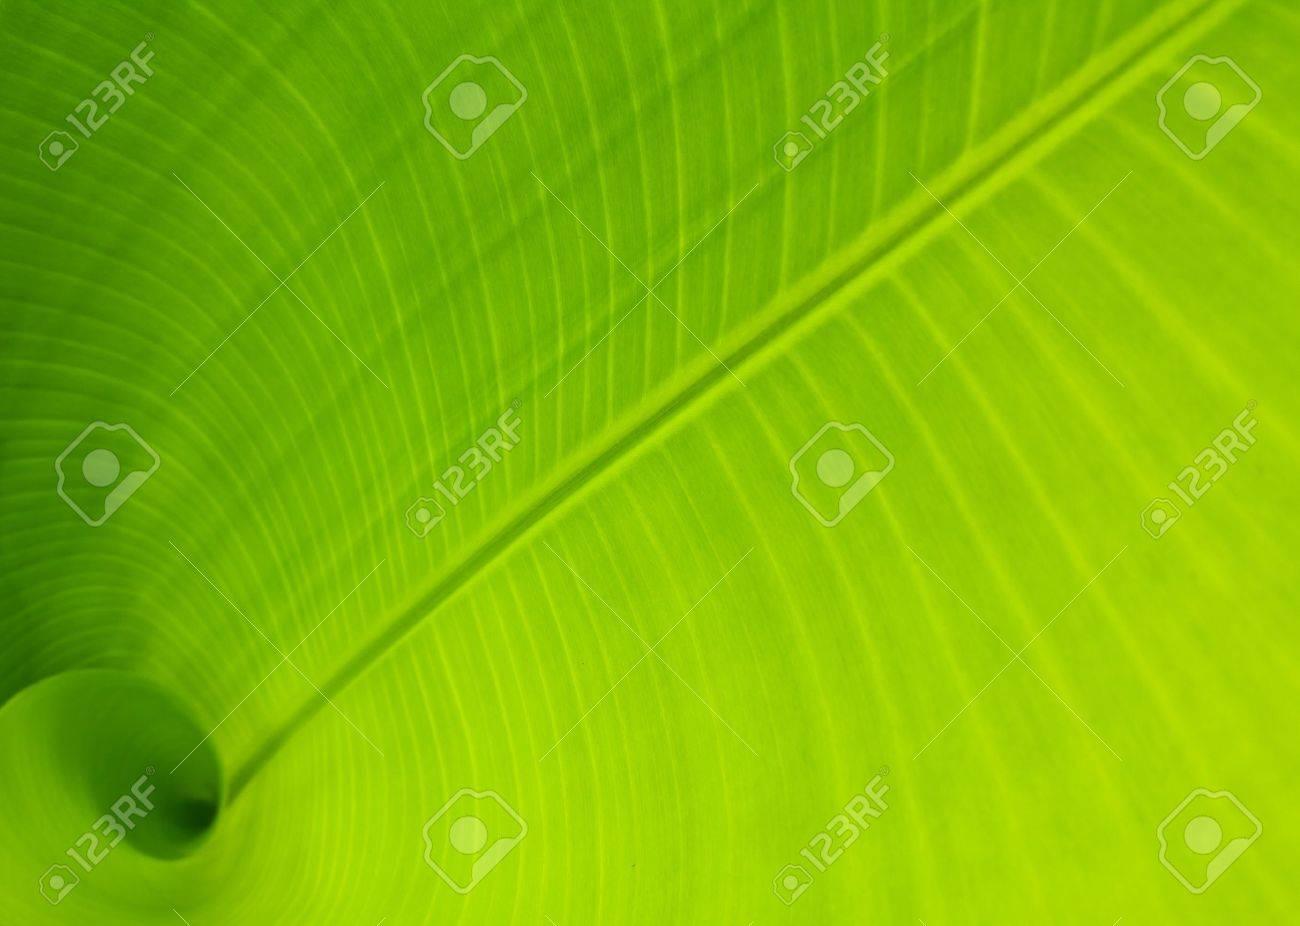 Banana leaf use as background Stock Photo - 9482344